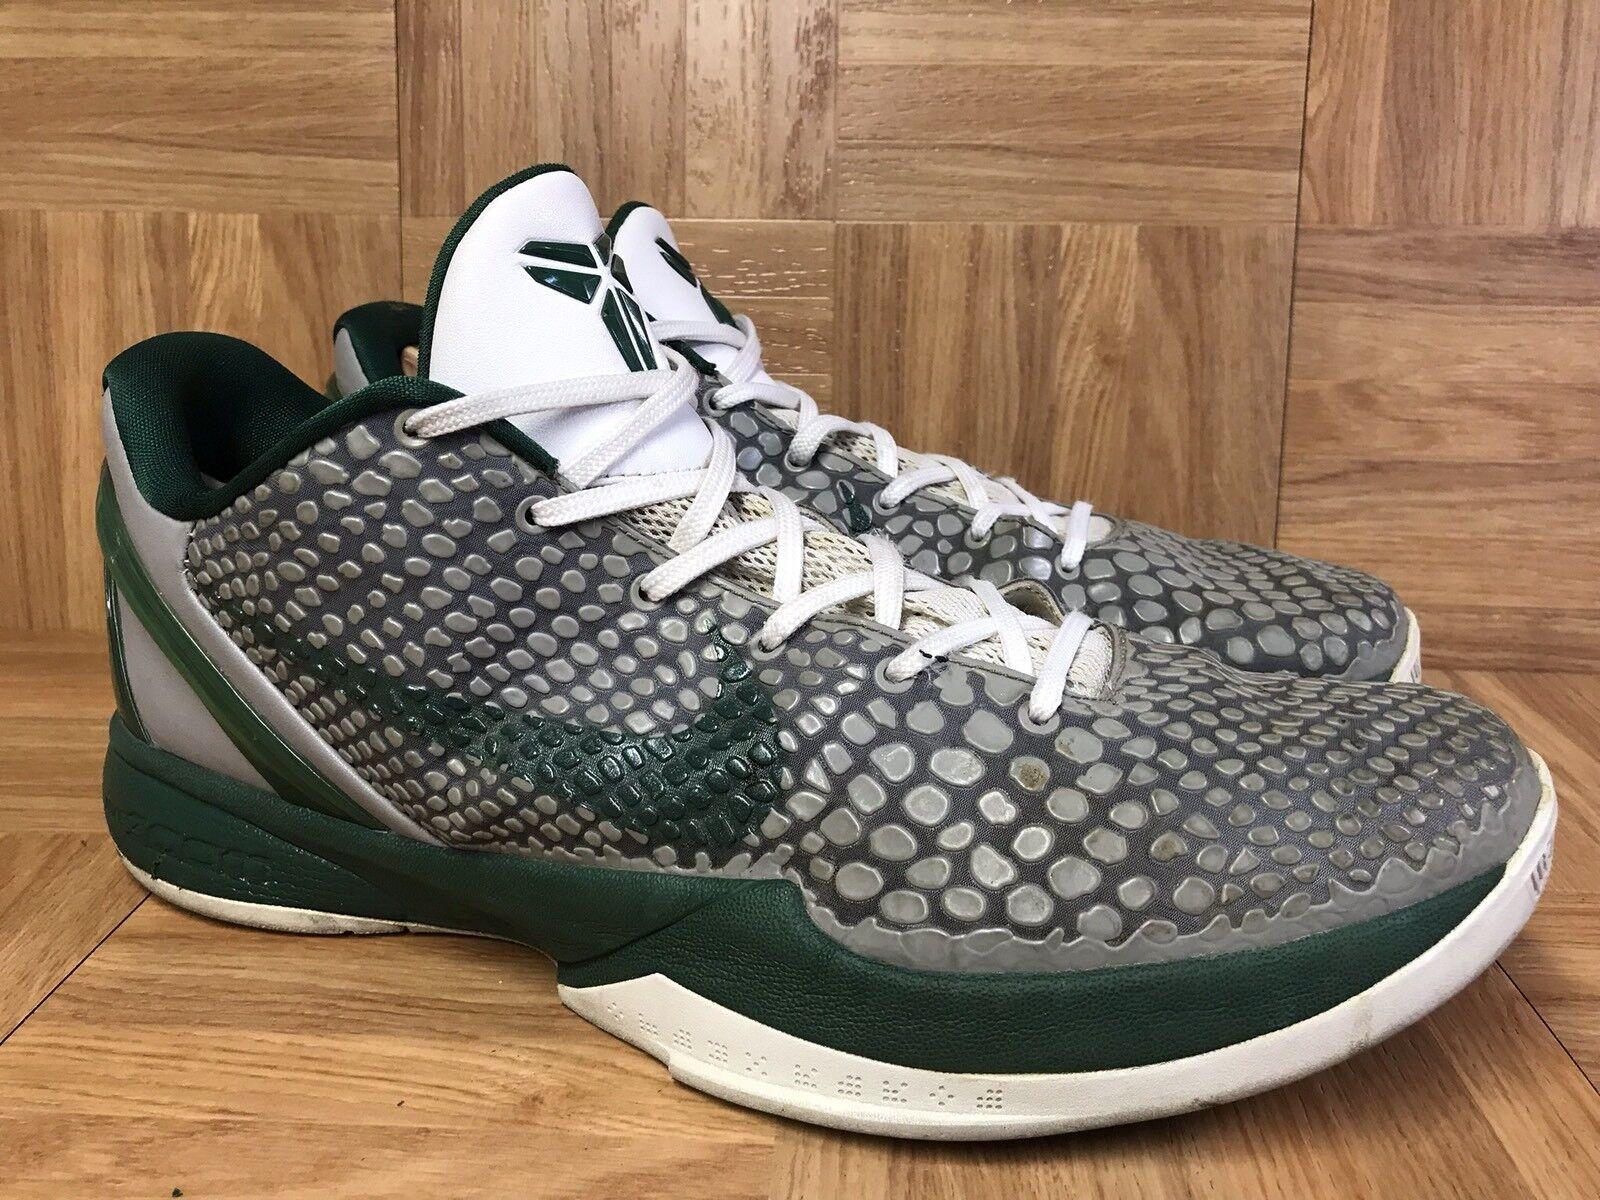 RARE  Nike Zoom Kobe VI 6 Wolf Fray Gorge Green Celtics Gradient 13 429659-009